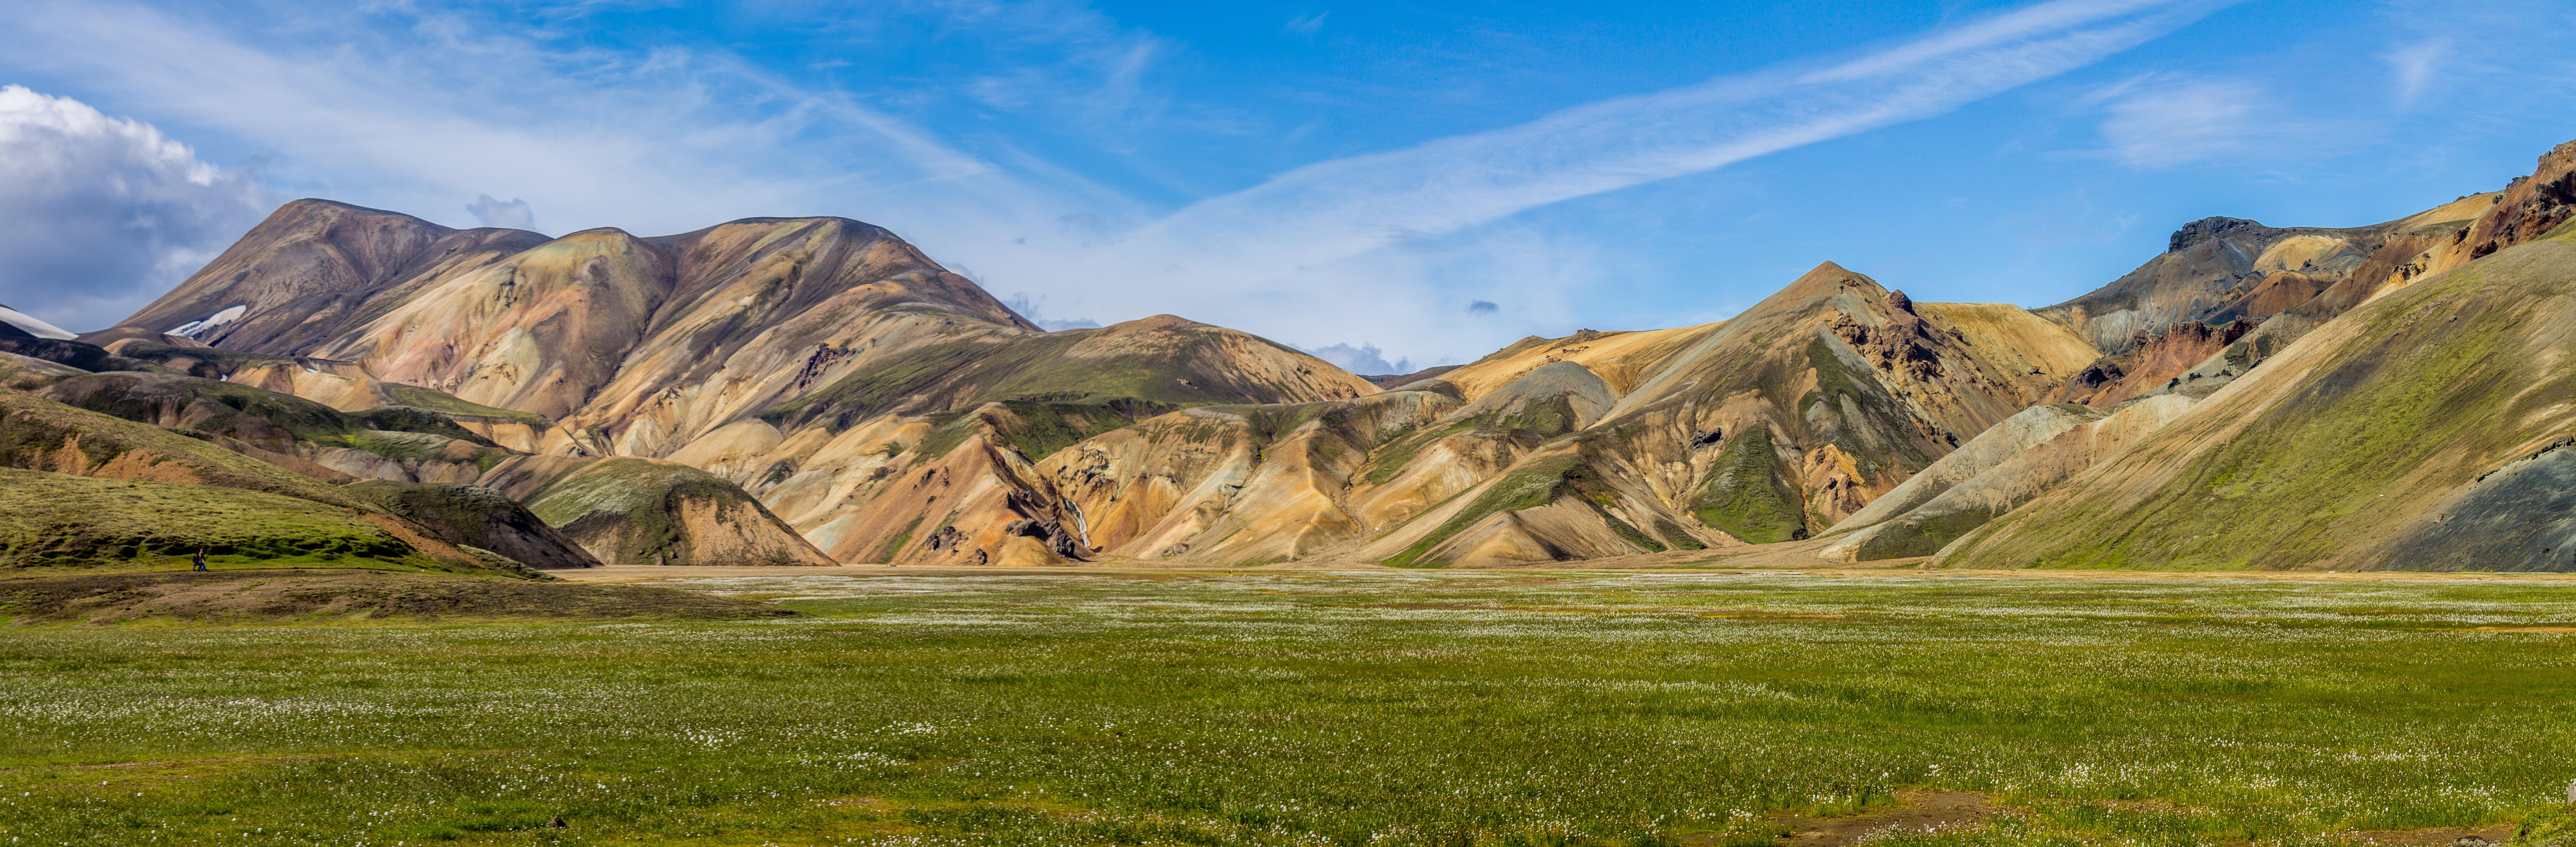 green grass under brown mountain hill during daytime